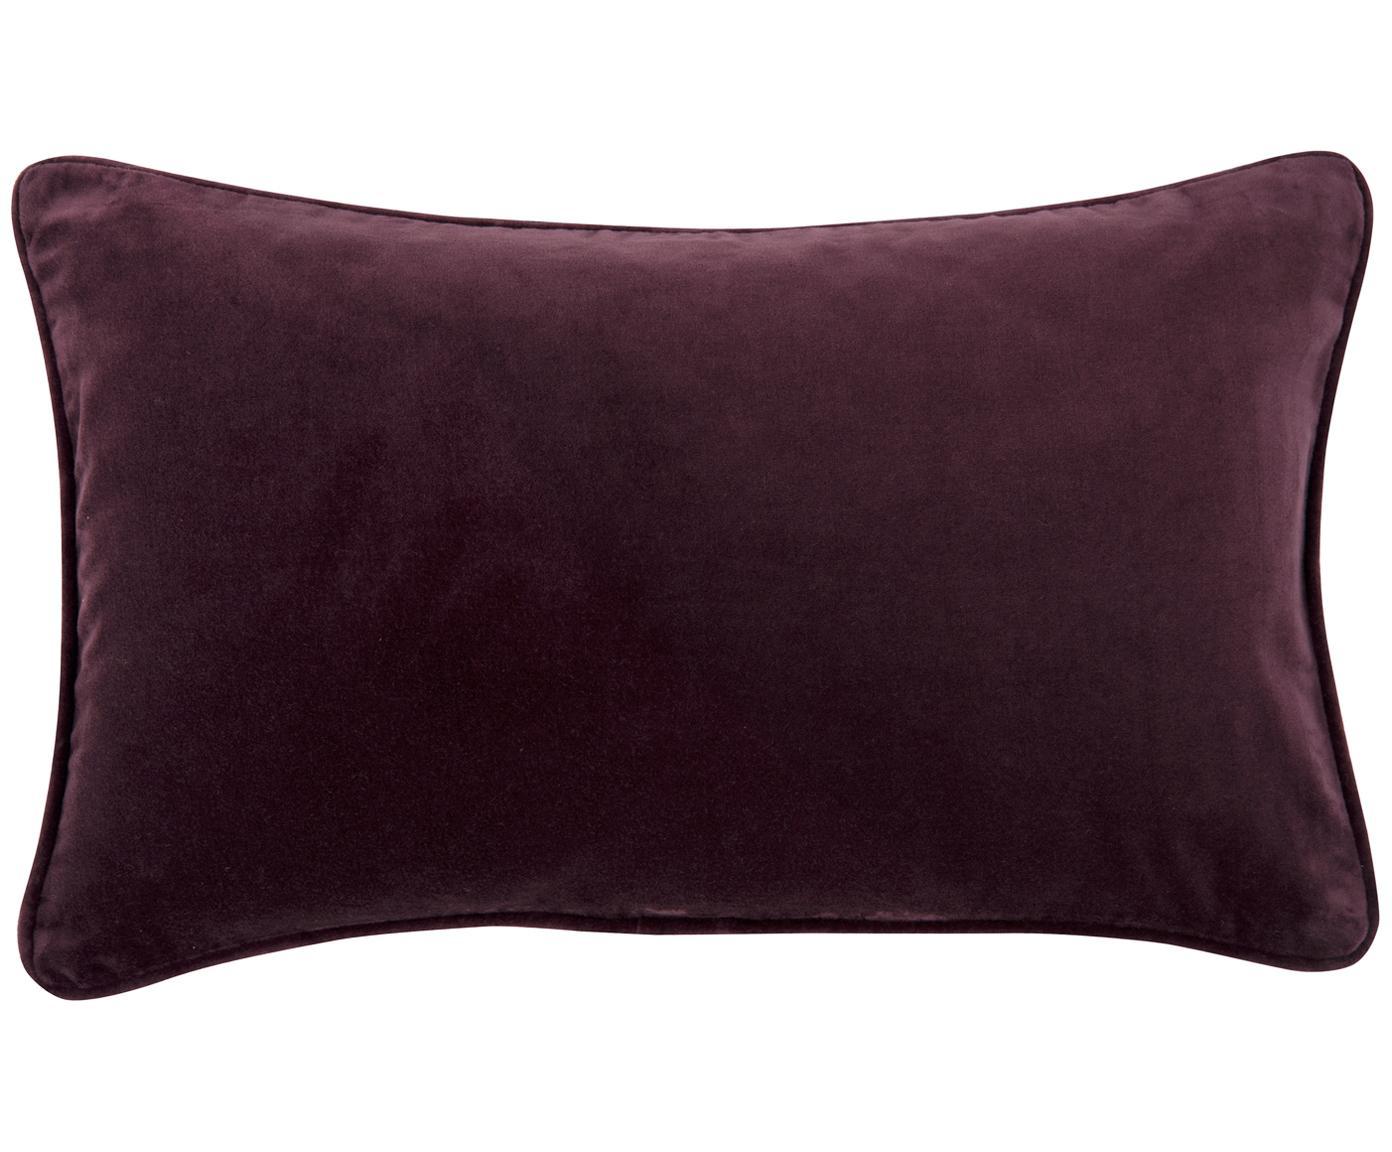 Fluwelen kussenhoes Dana, 100% katoen fluweel, Auberginekleurig, 30 x 50 cm